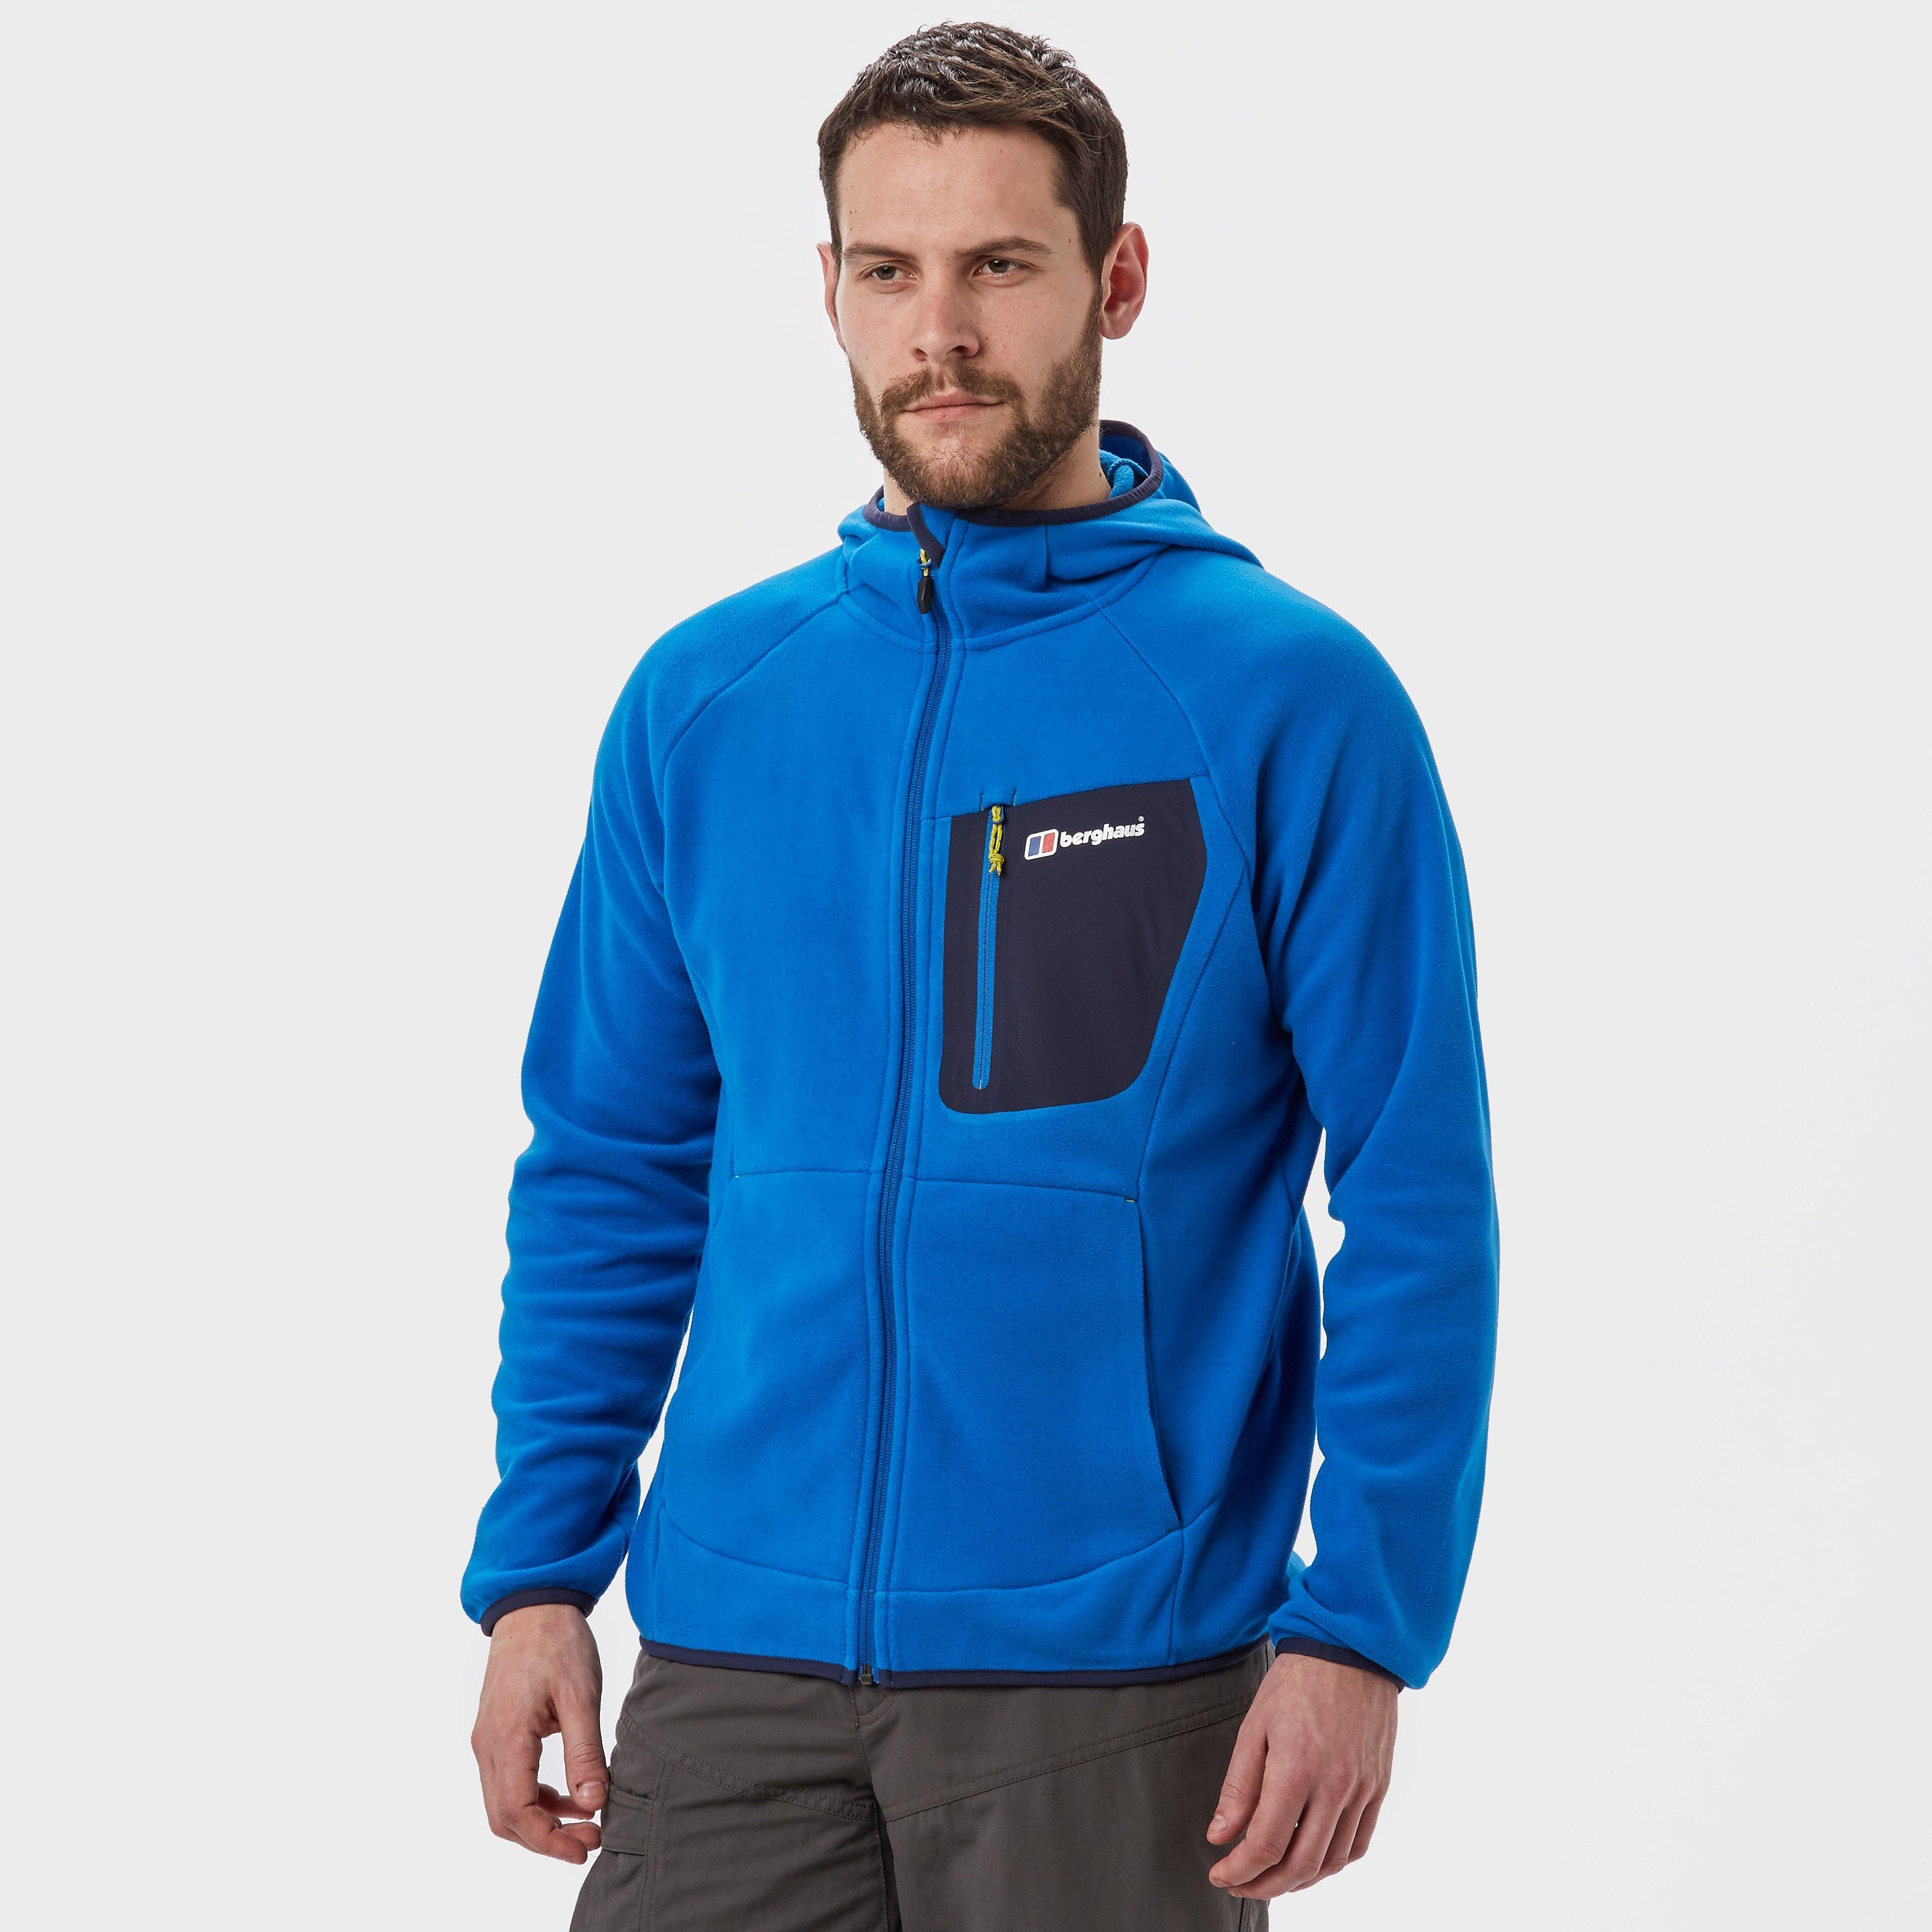 Berghaus Deception Men's Fleece Jacket